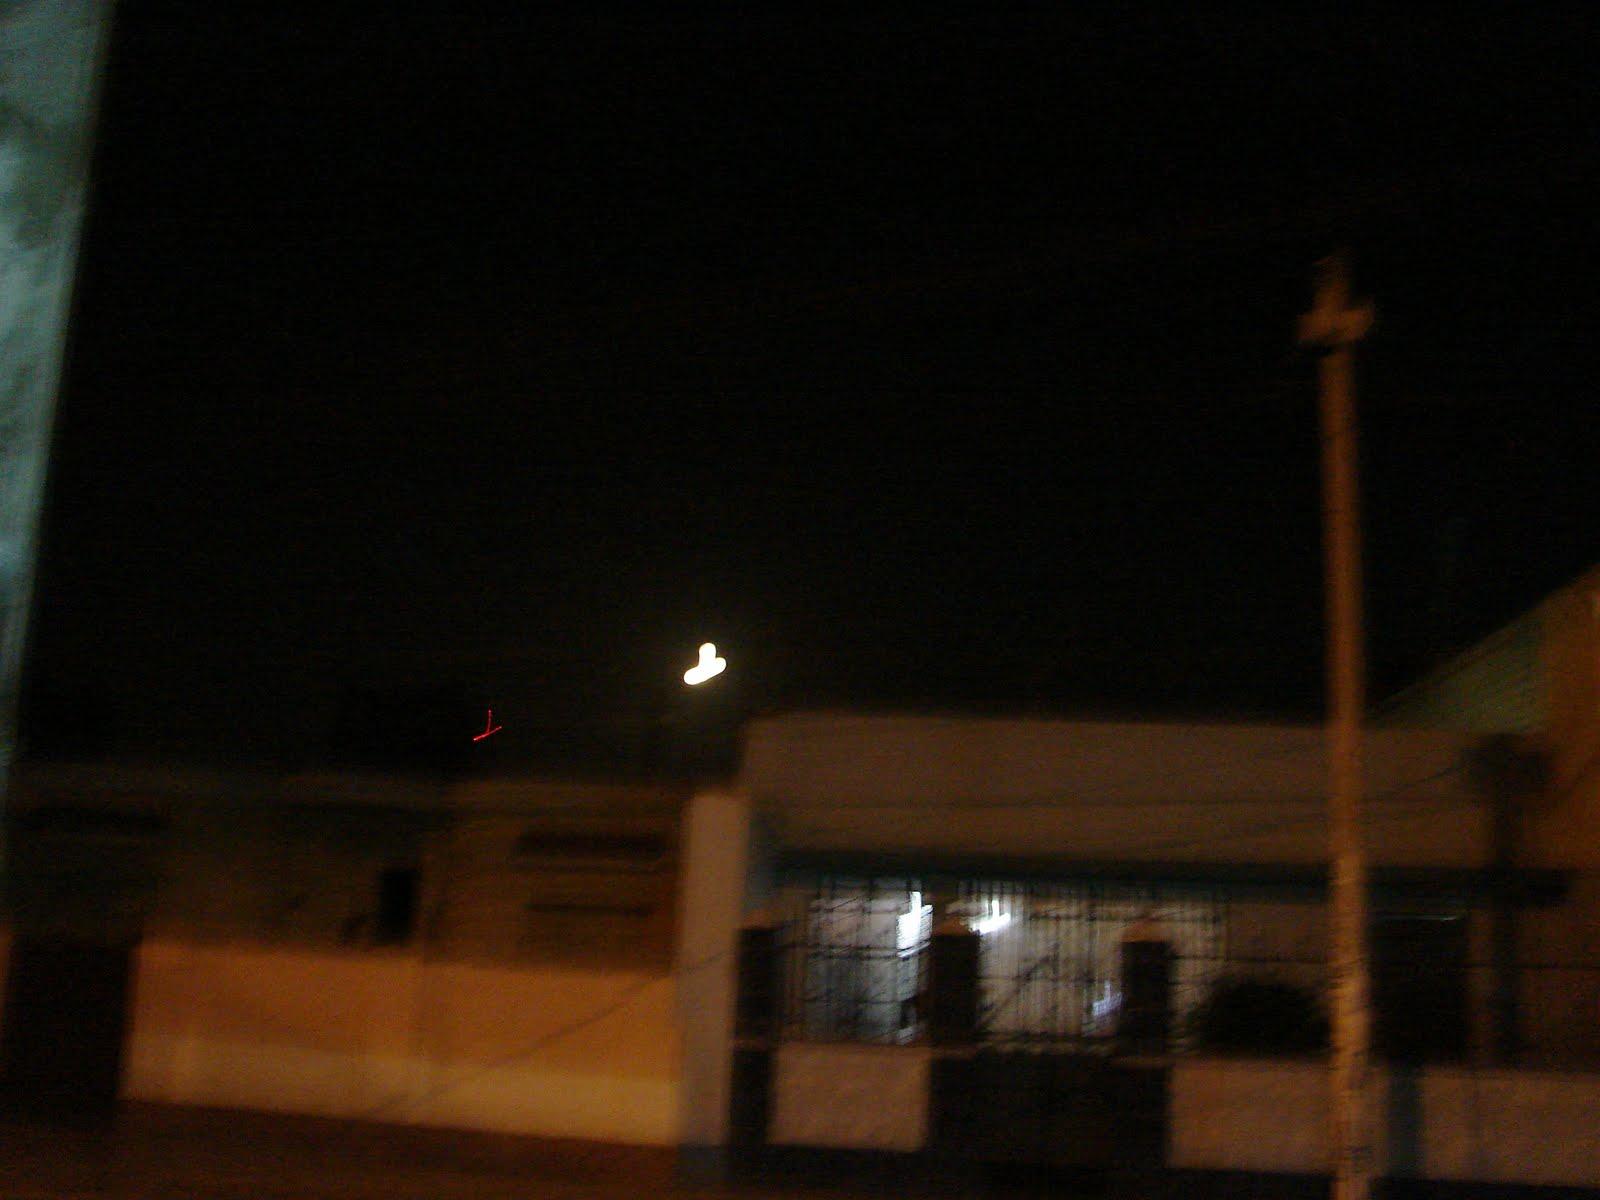 ATENCION-12enero-13-14-15-16-17...2012..Ovni y Luna forman YY ,9:33pm x Fito.33.p.UFO...